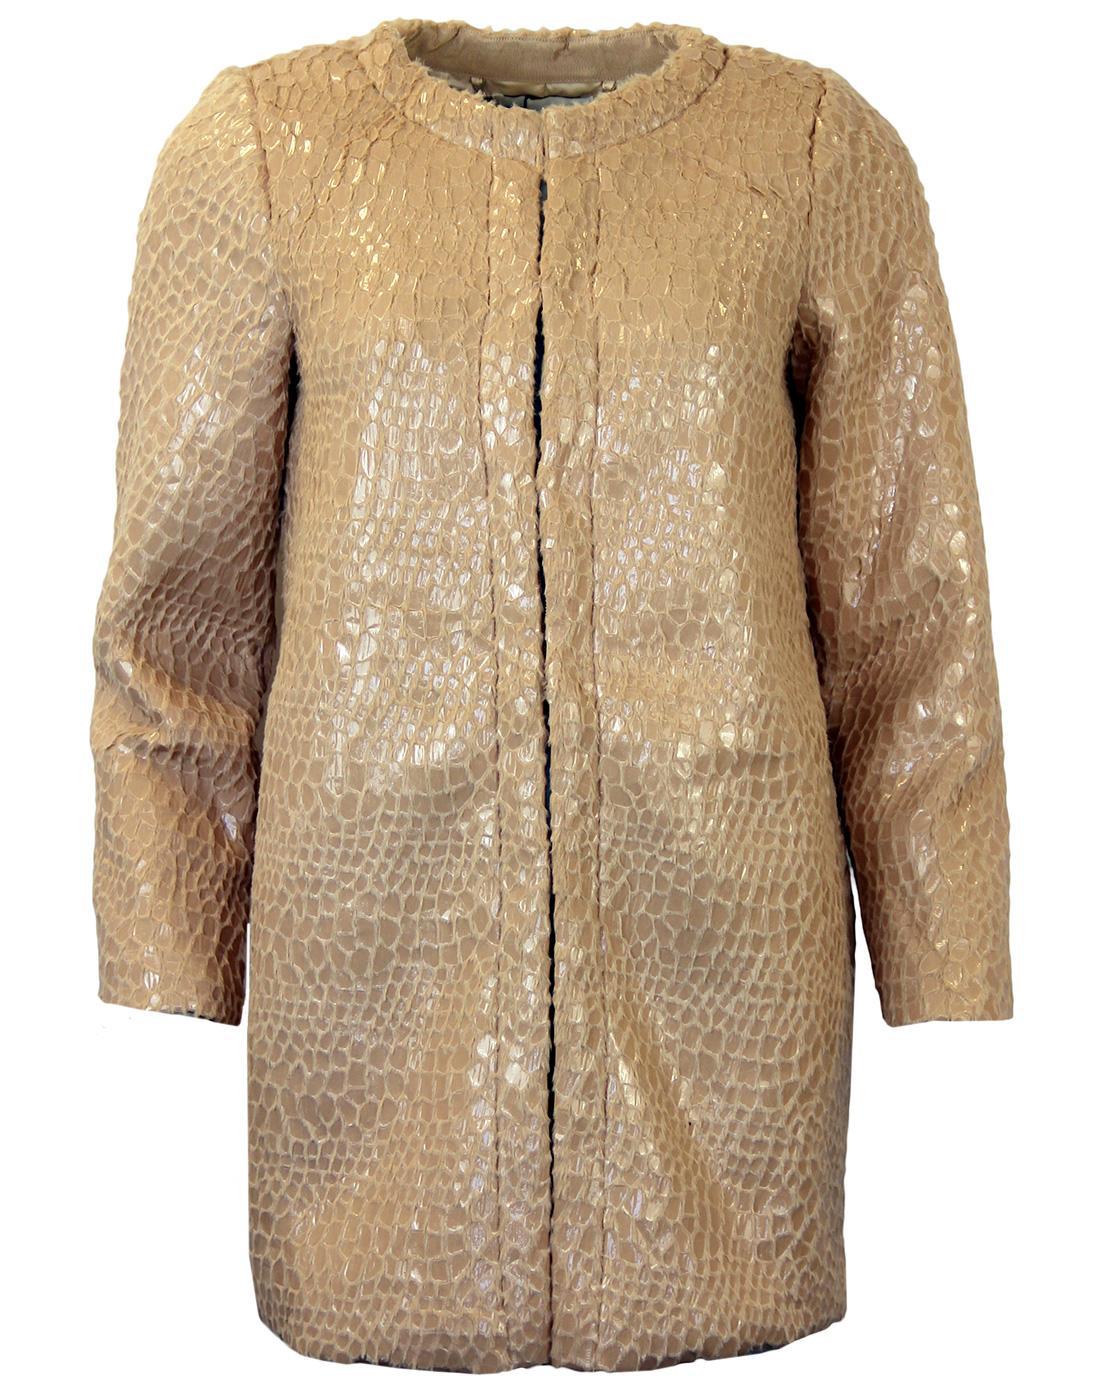 Nina DARLING Retro 60's Vintage Faux Fur Coat